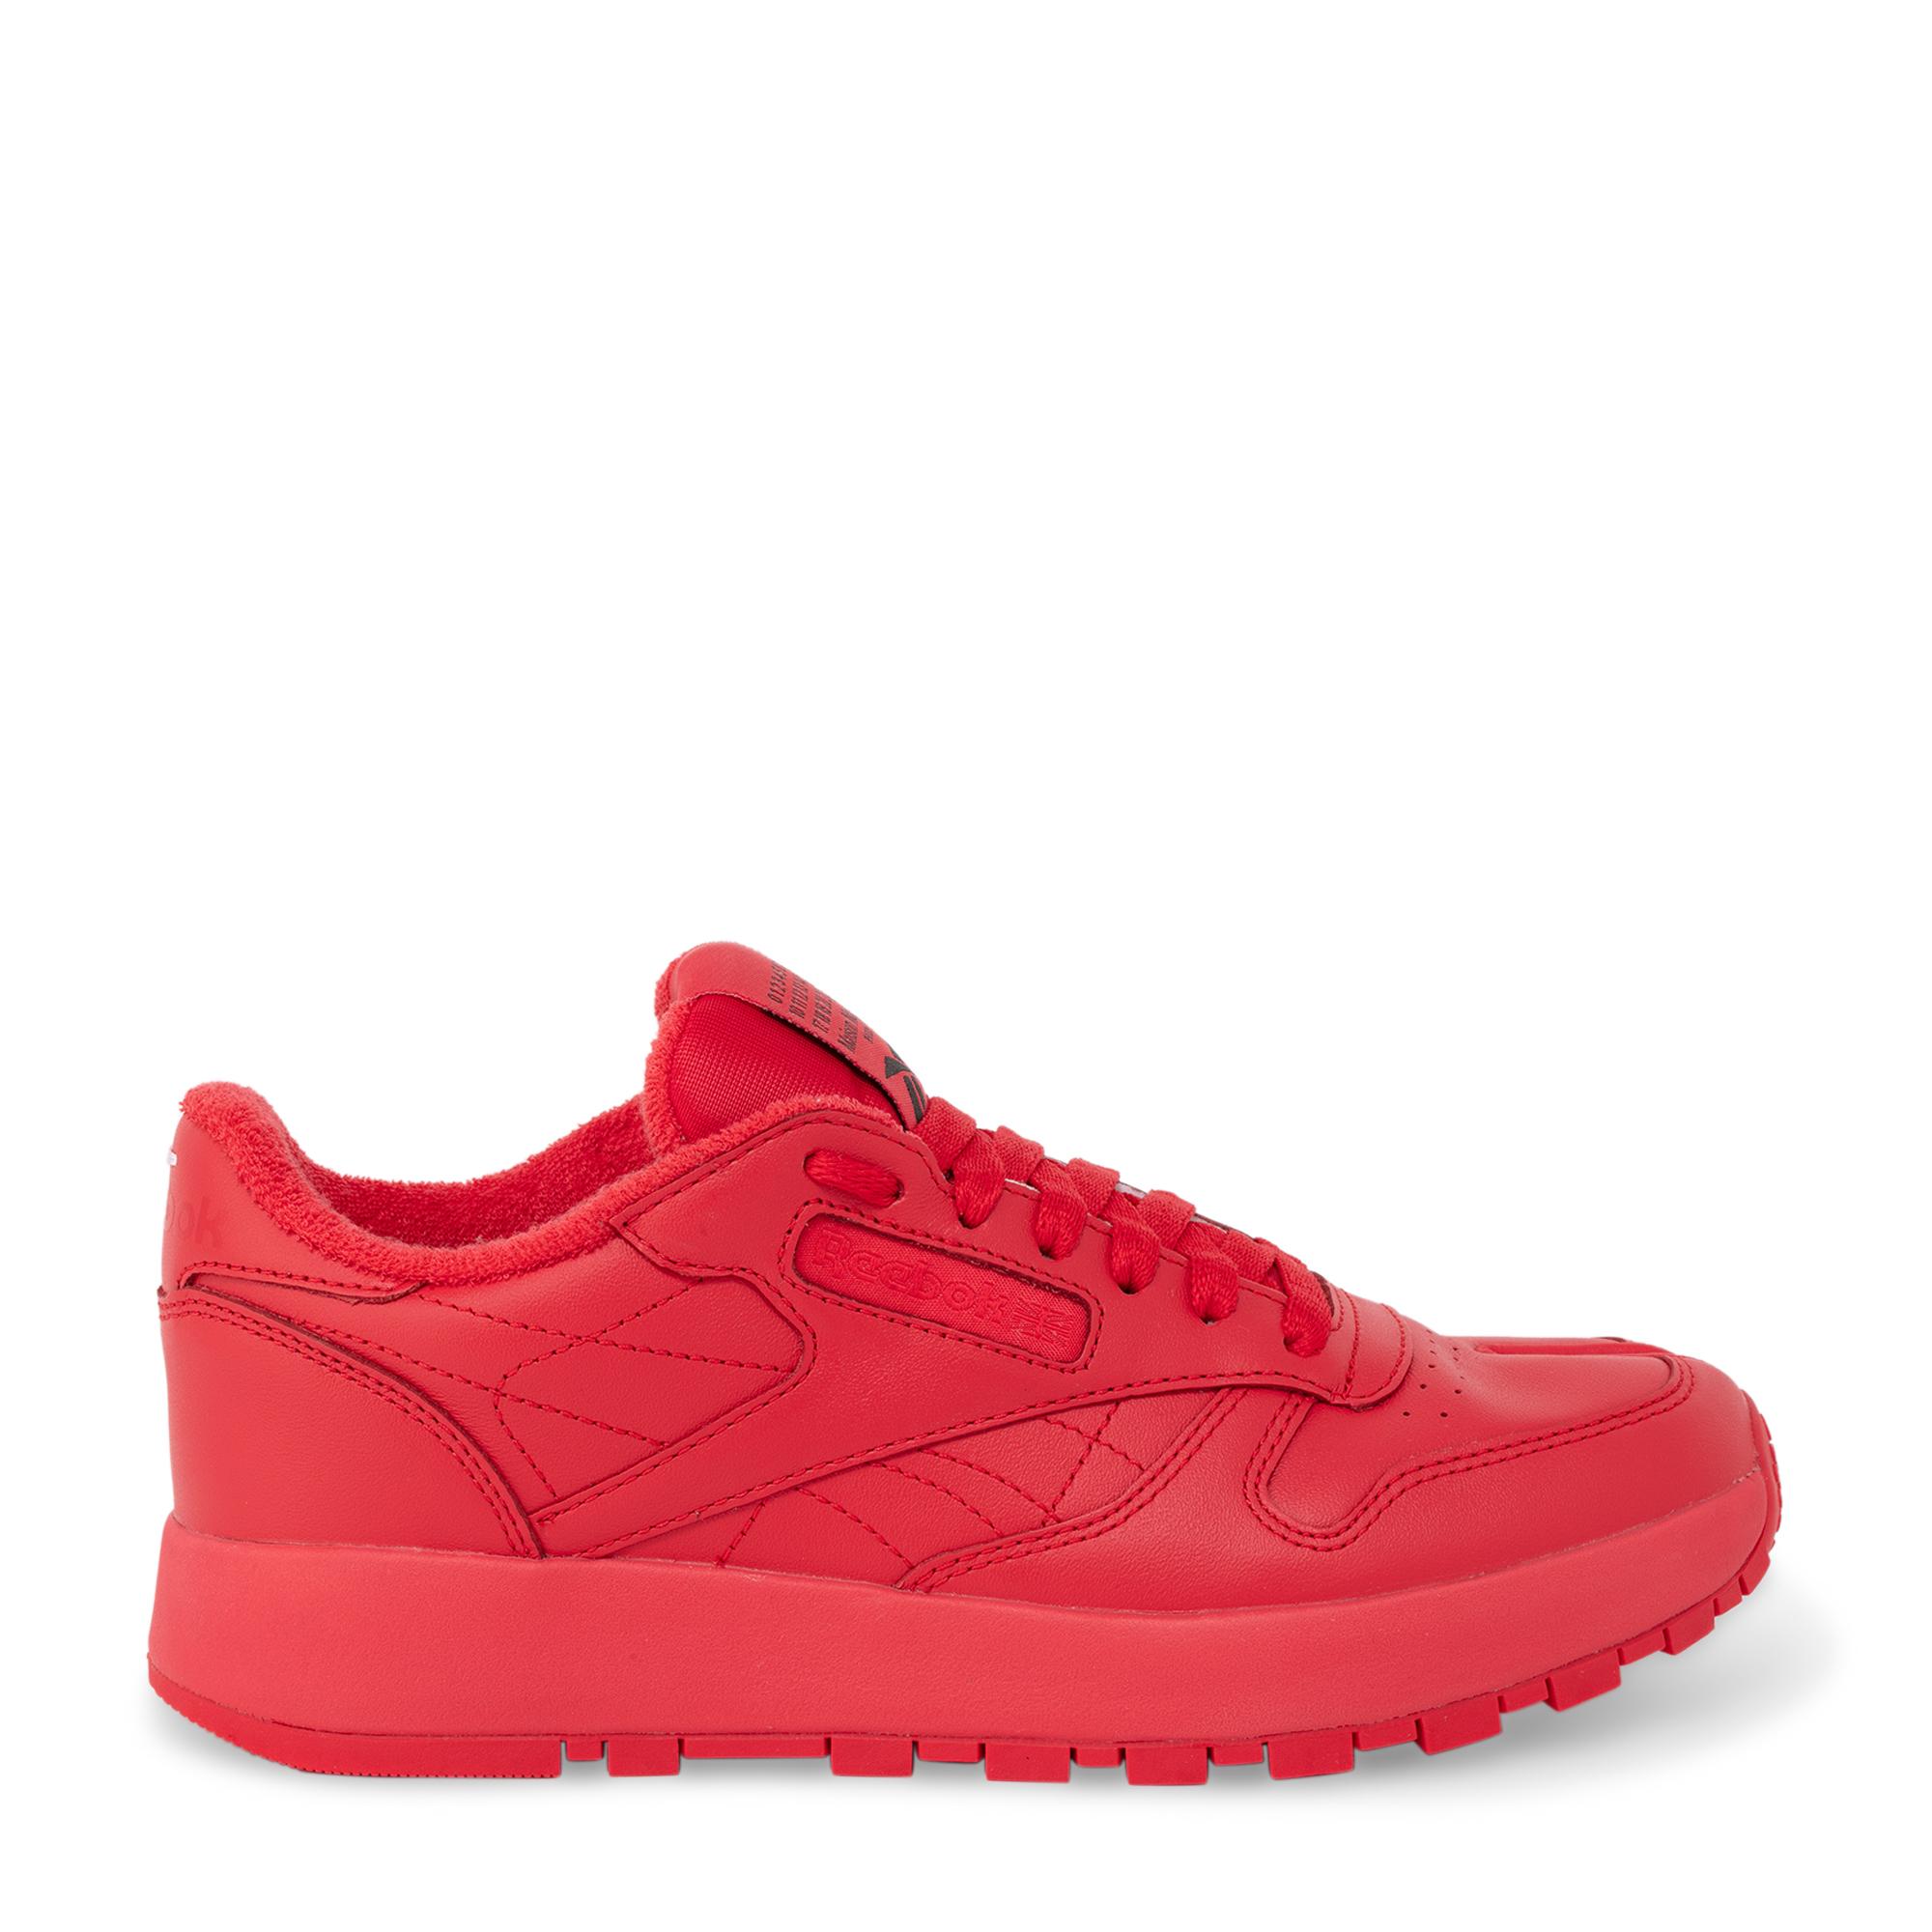 x Maison Margiela Classic Leather Tabi sneakers